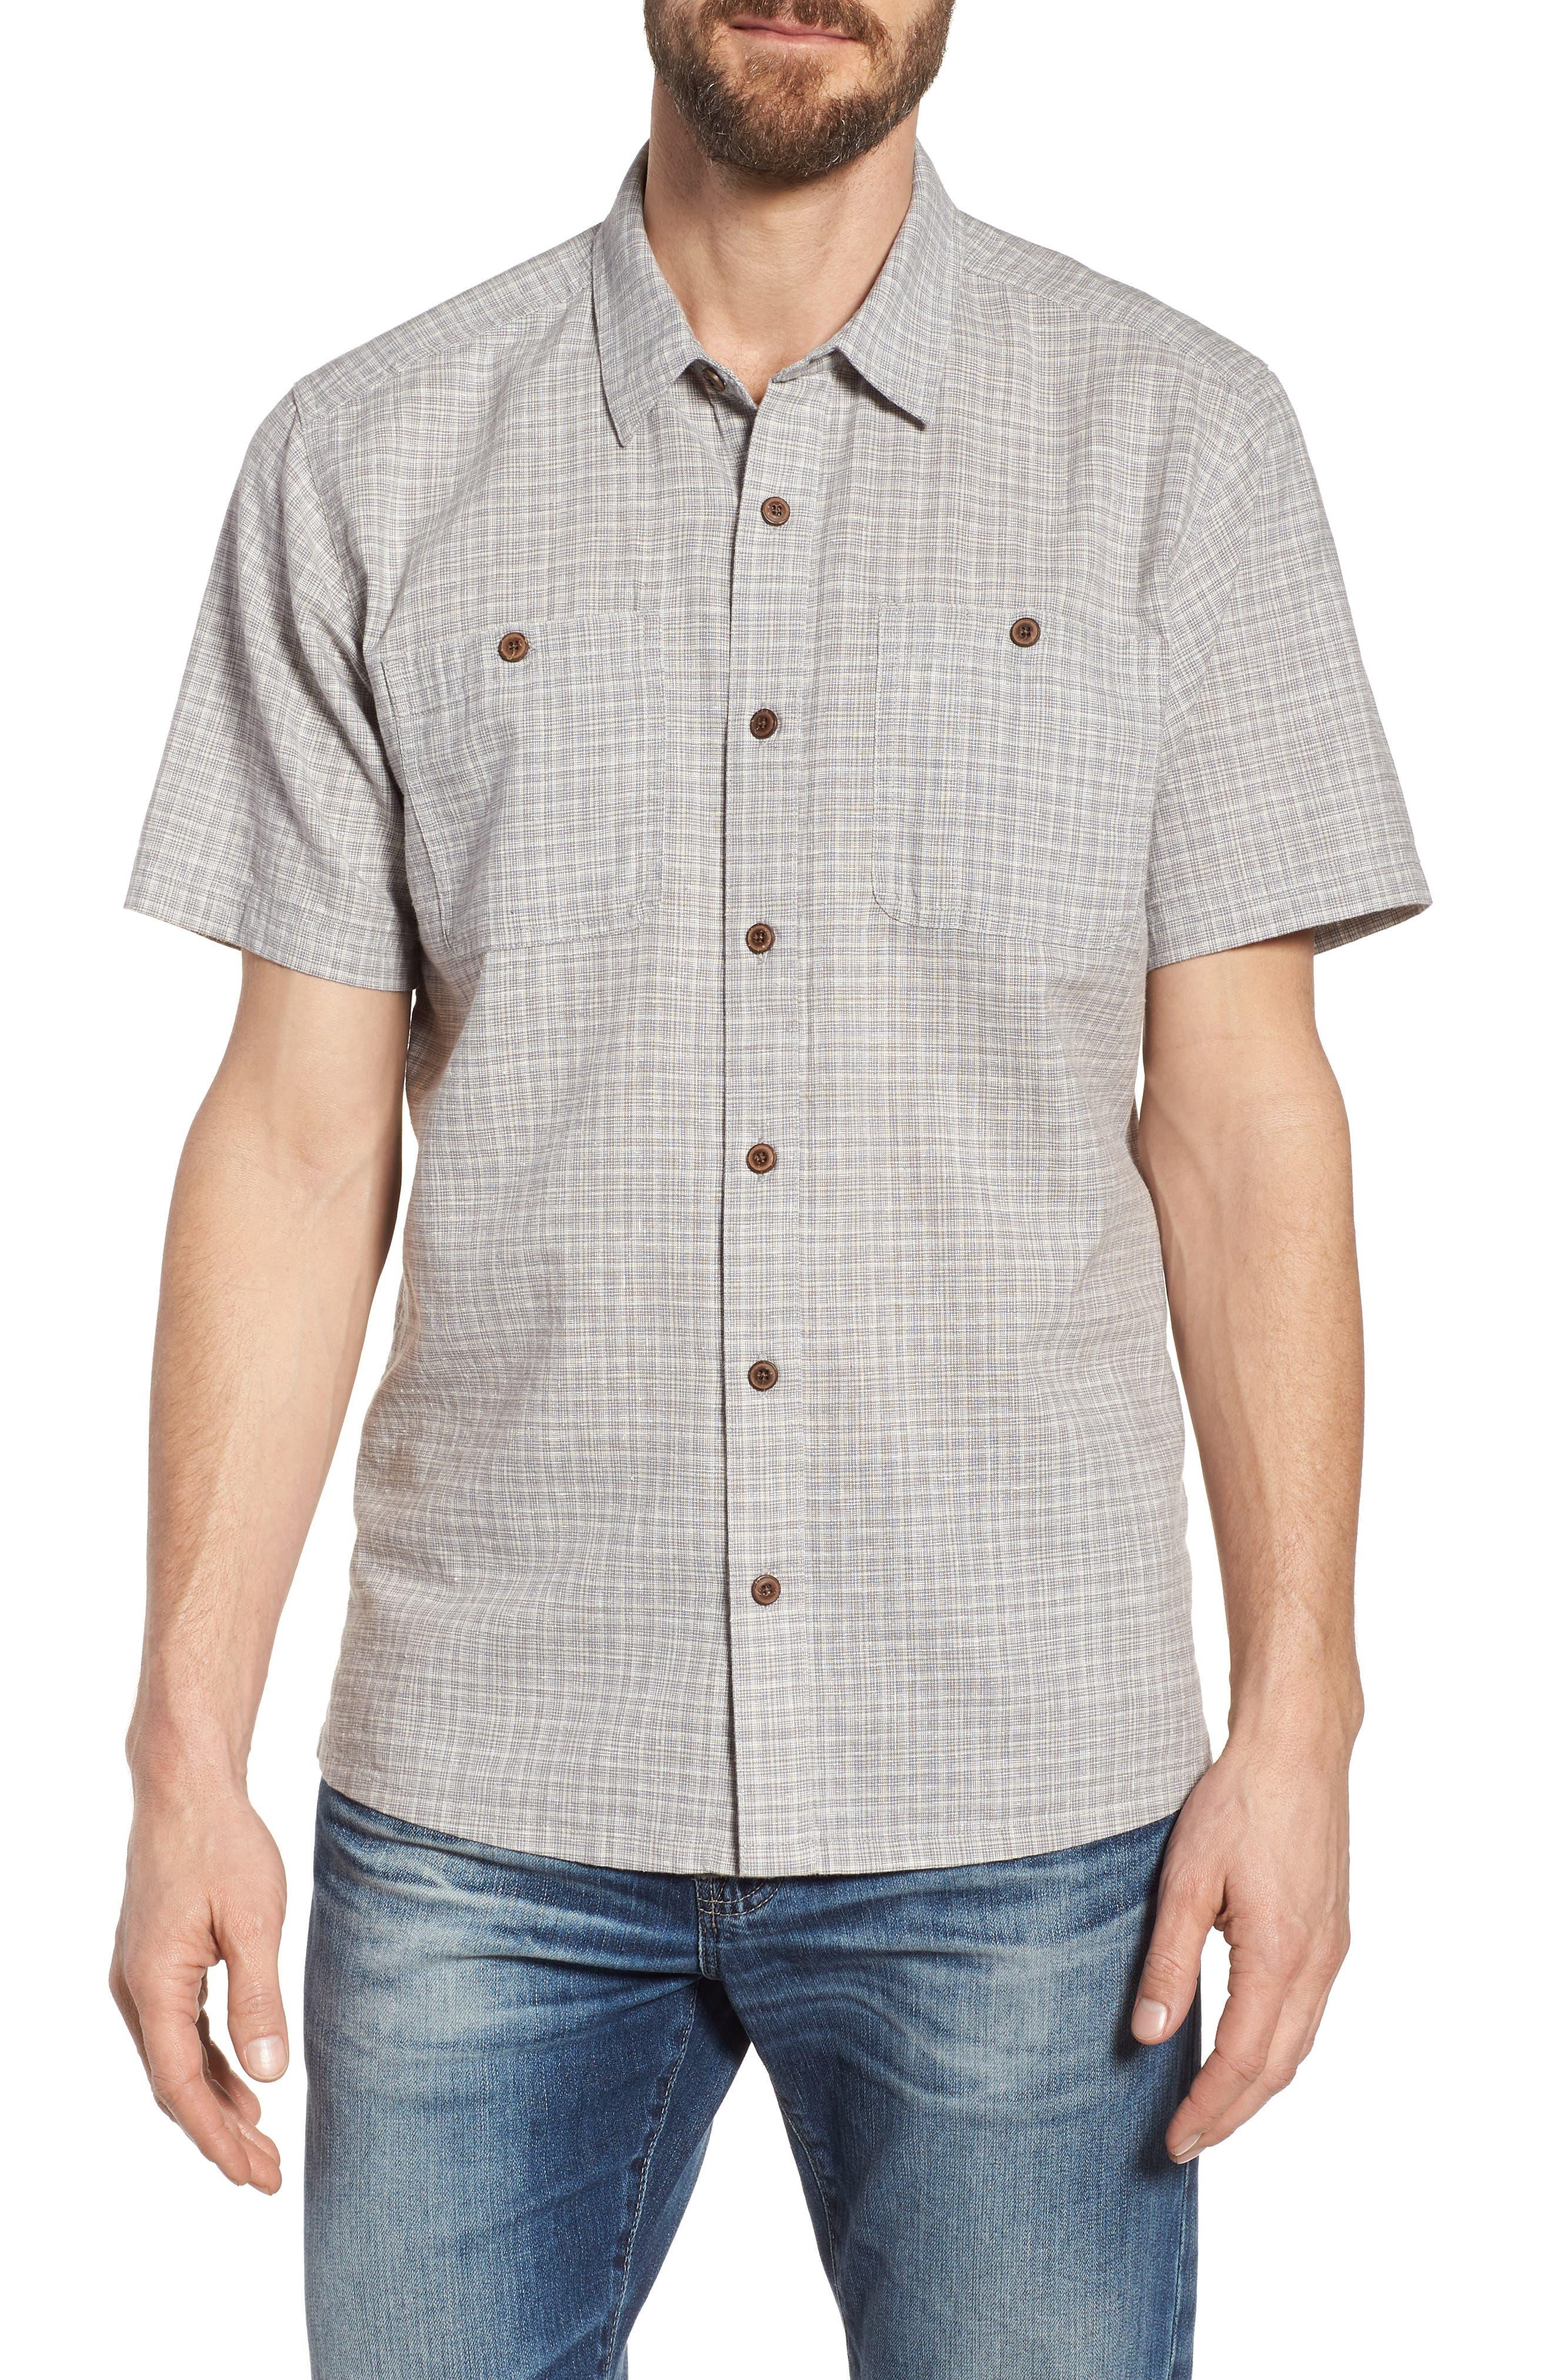 'Back Step' Regular Fit Check Short Sleeve Sport Shirt,                             Main thumbnail 1, color,                             Tino/ Feather Grey